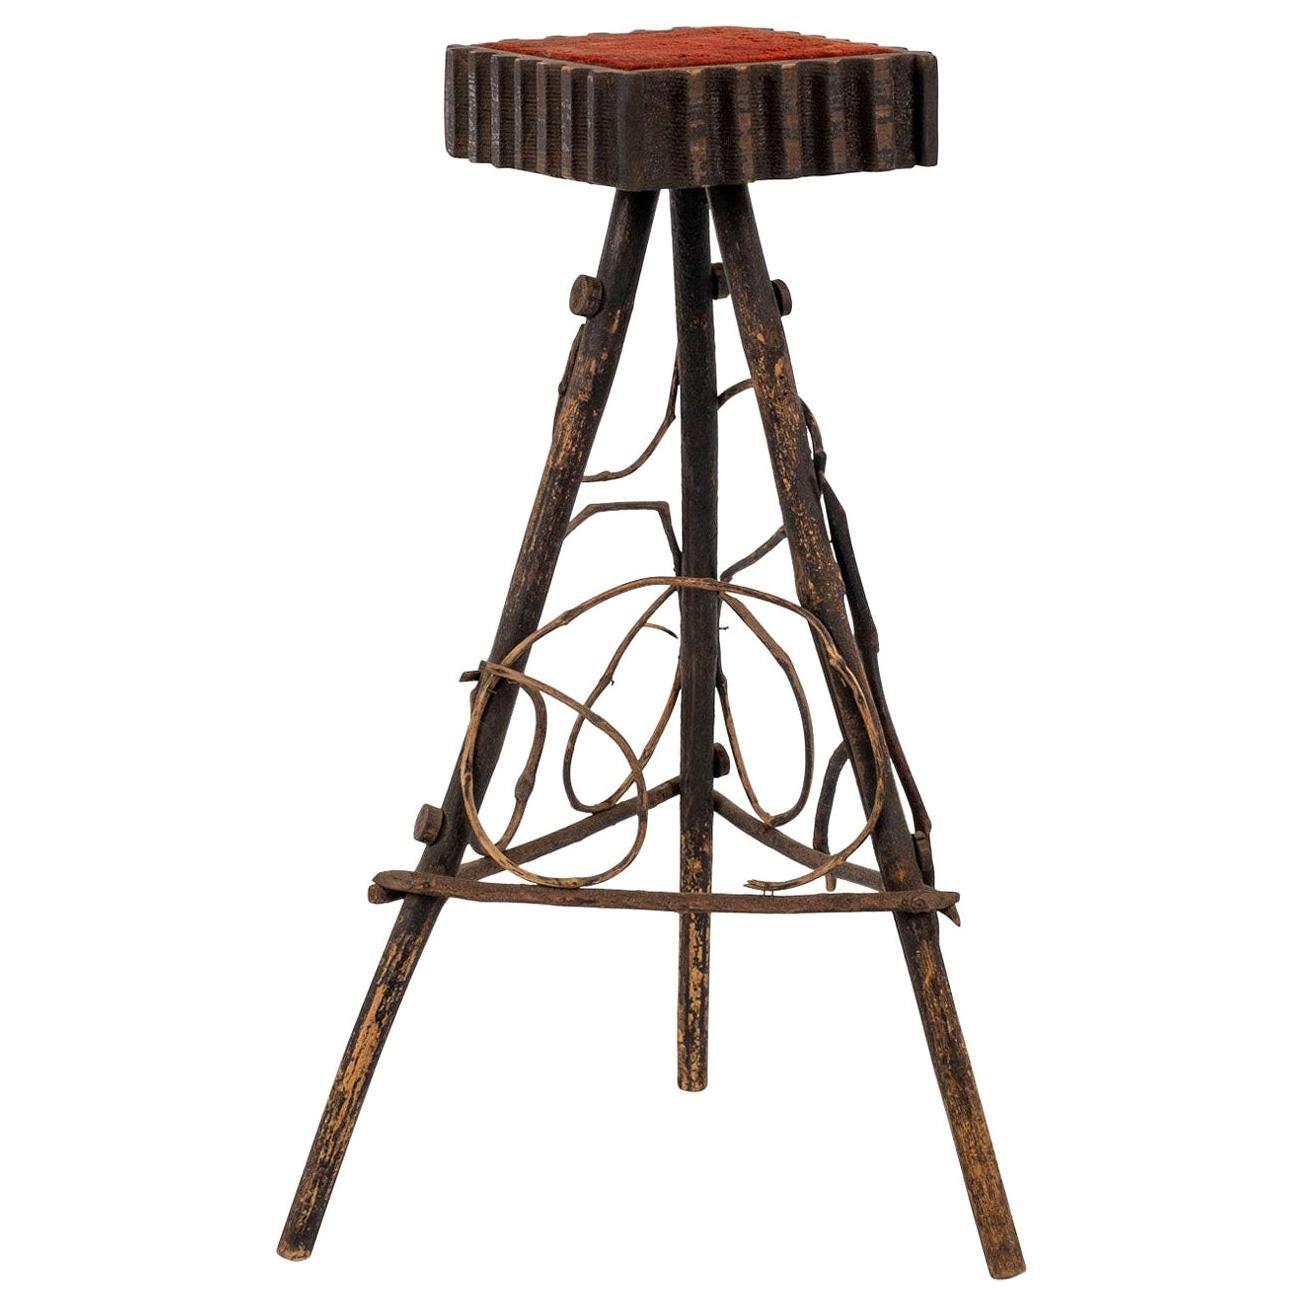 Antique Folk Art Twig Stand